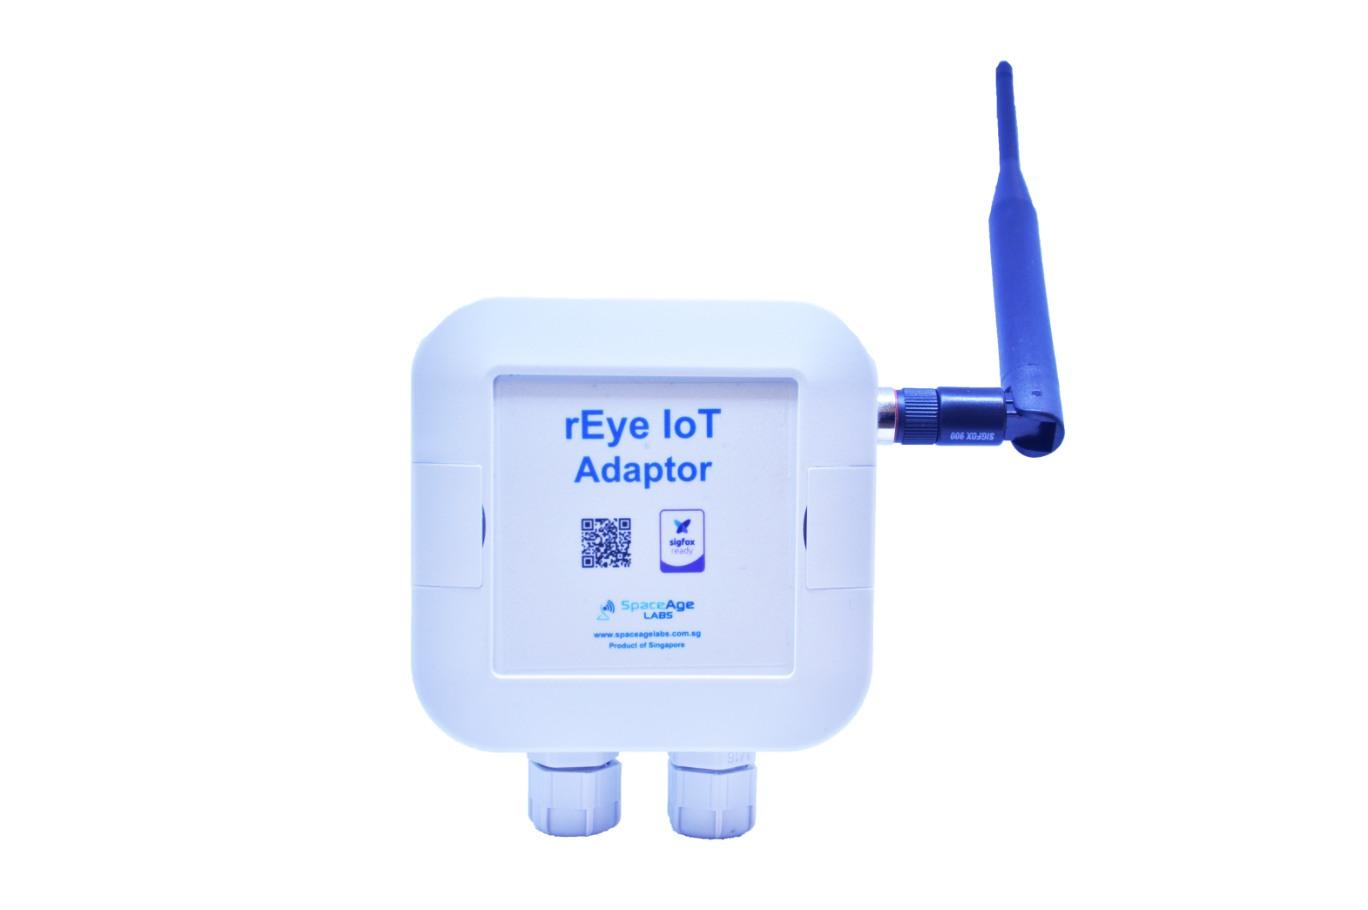 rEye Sigfox Adaptor - Analog - RC4   Sigfox Partner Network   The